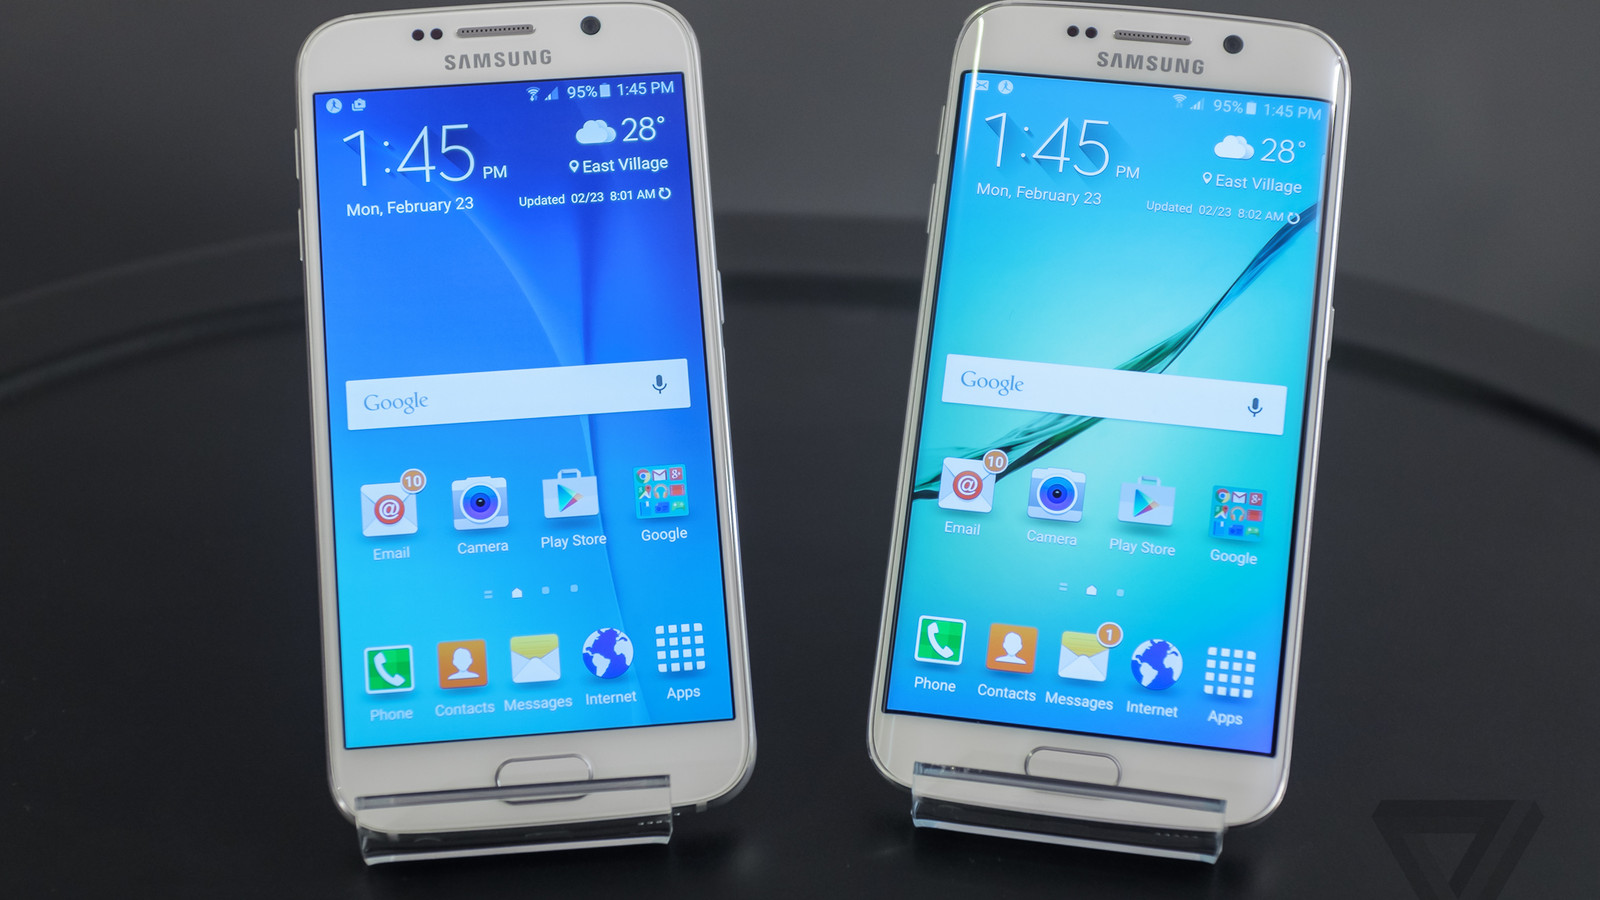 Green Galaxy s6 Edge Release Date Galaxy s6 Release Date is